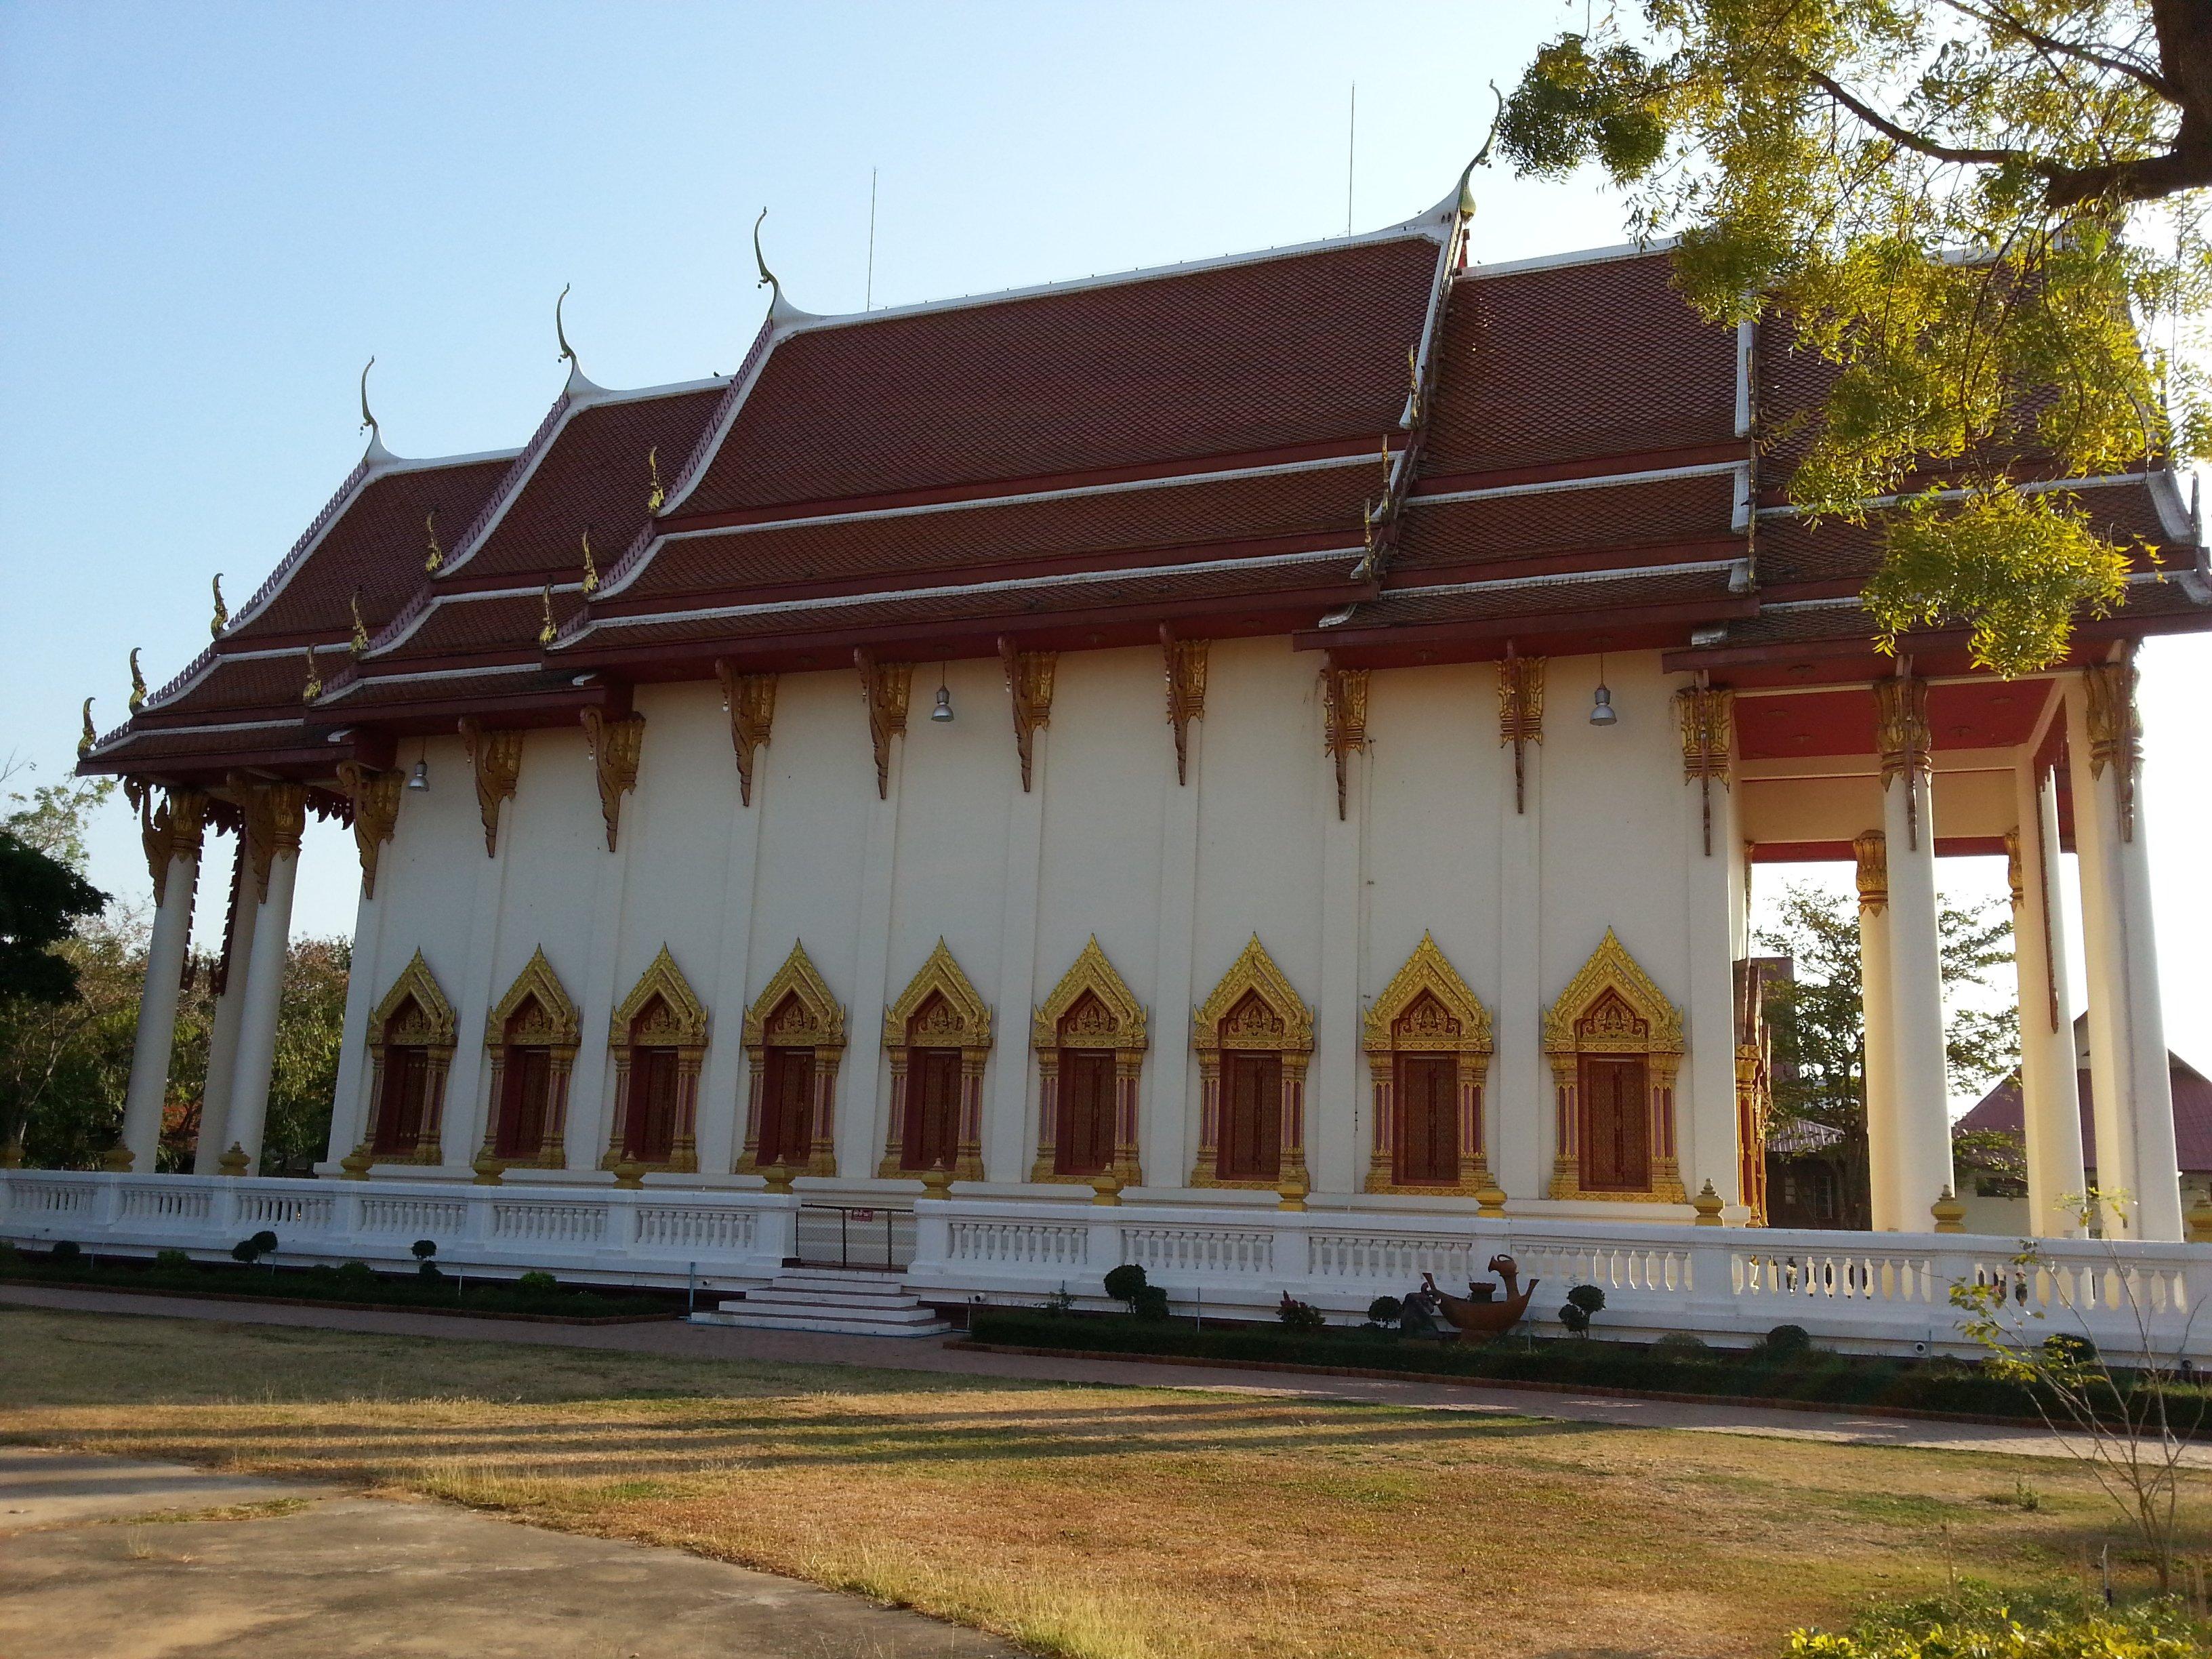 Ordination hall at Wat Pothisomphon